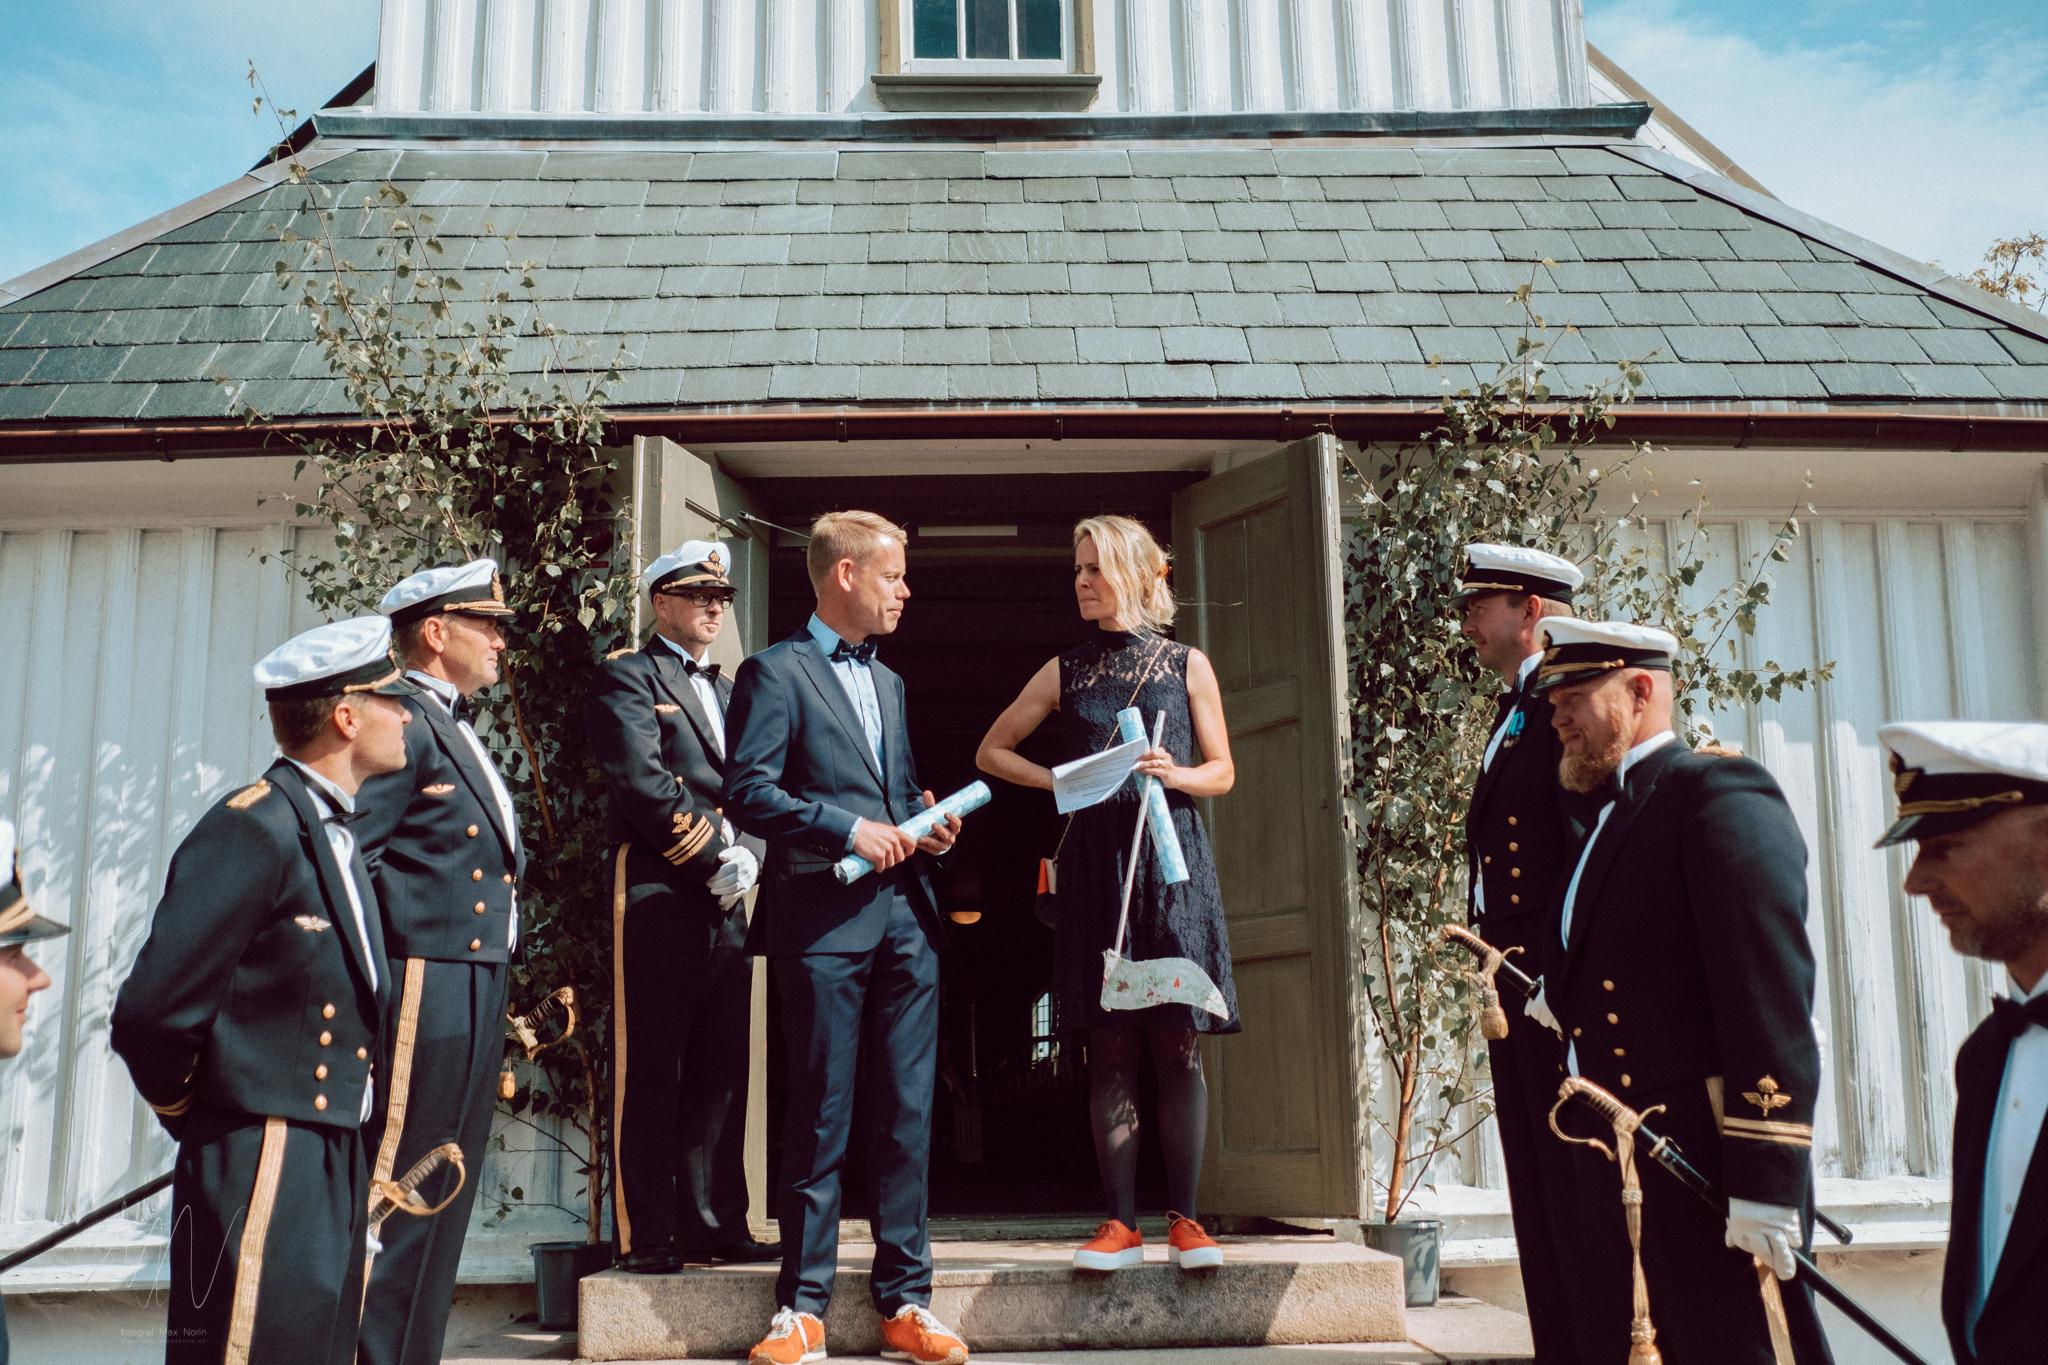 Bröllop-fotografmaxnorin.se-MariaMarcus-147.JPG